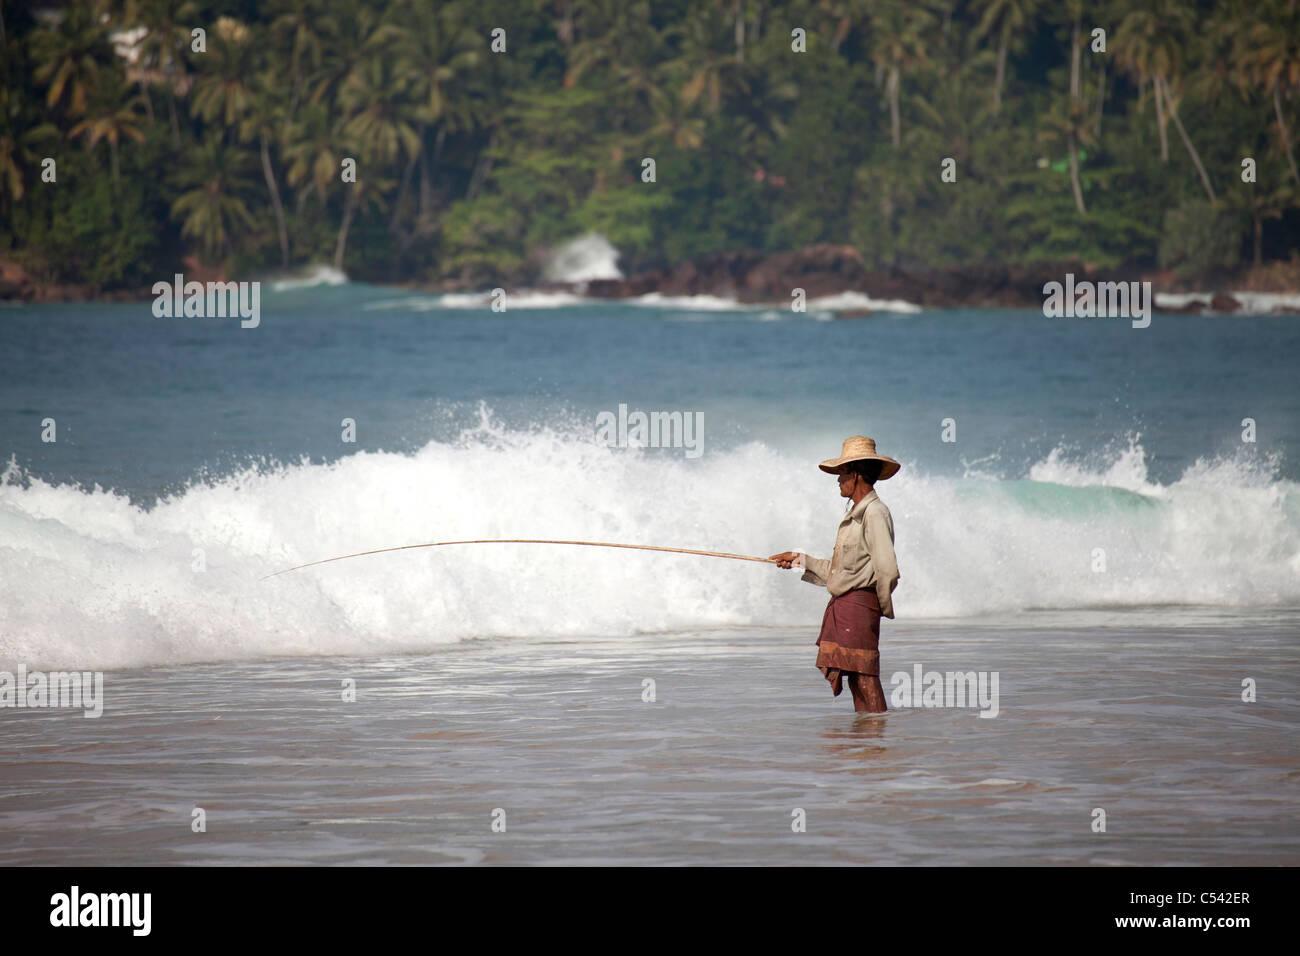 fisherman angling in the waves of Mirissa beach, Sri Lanka - Stock Image